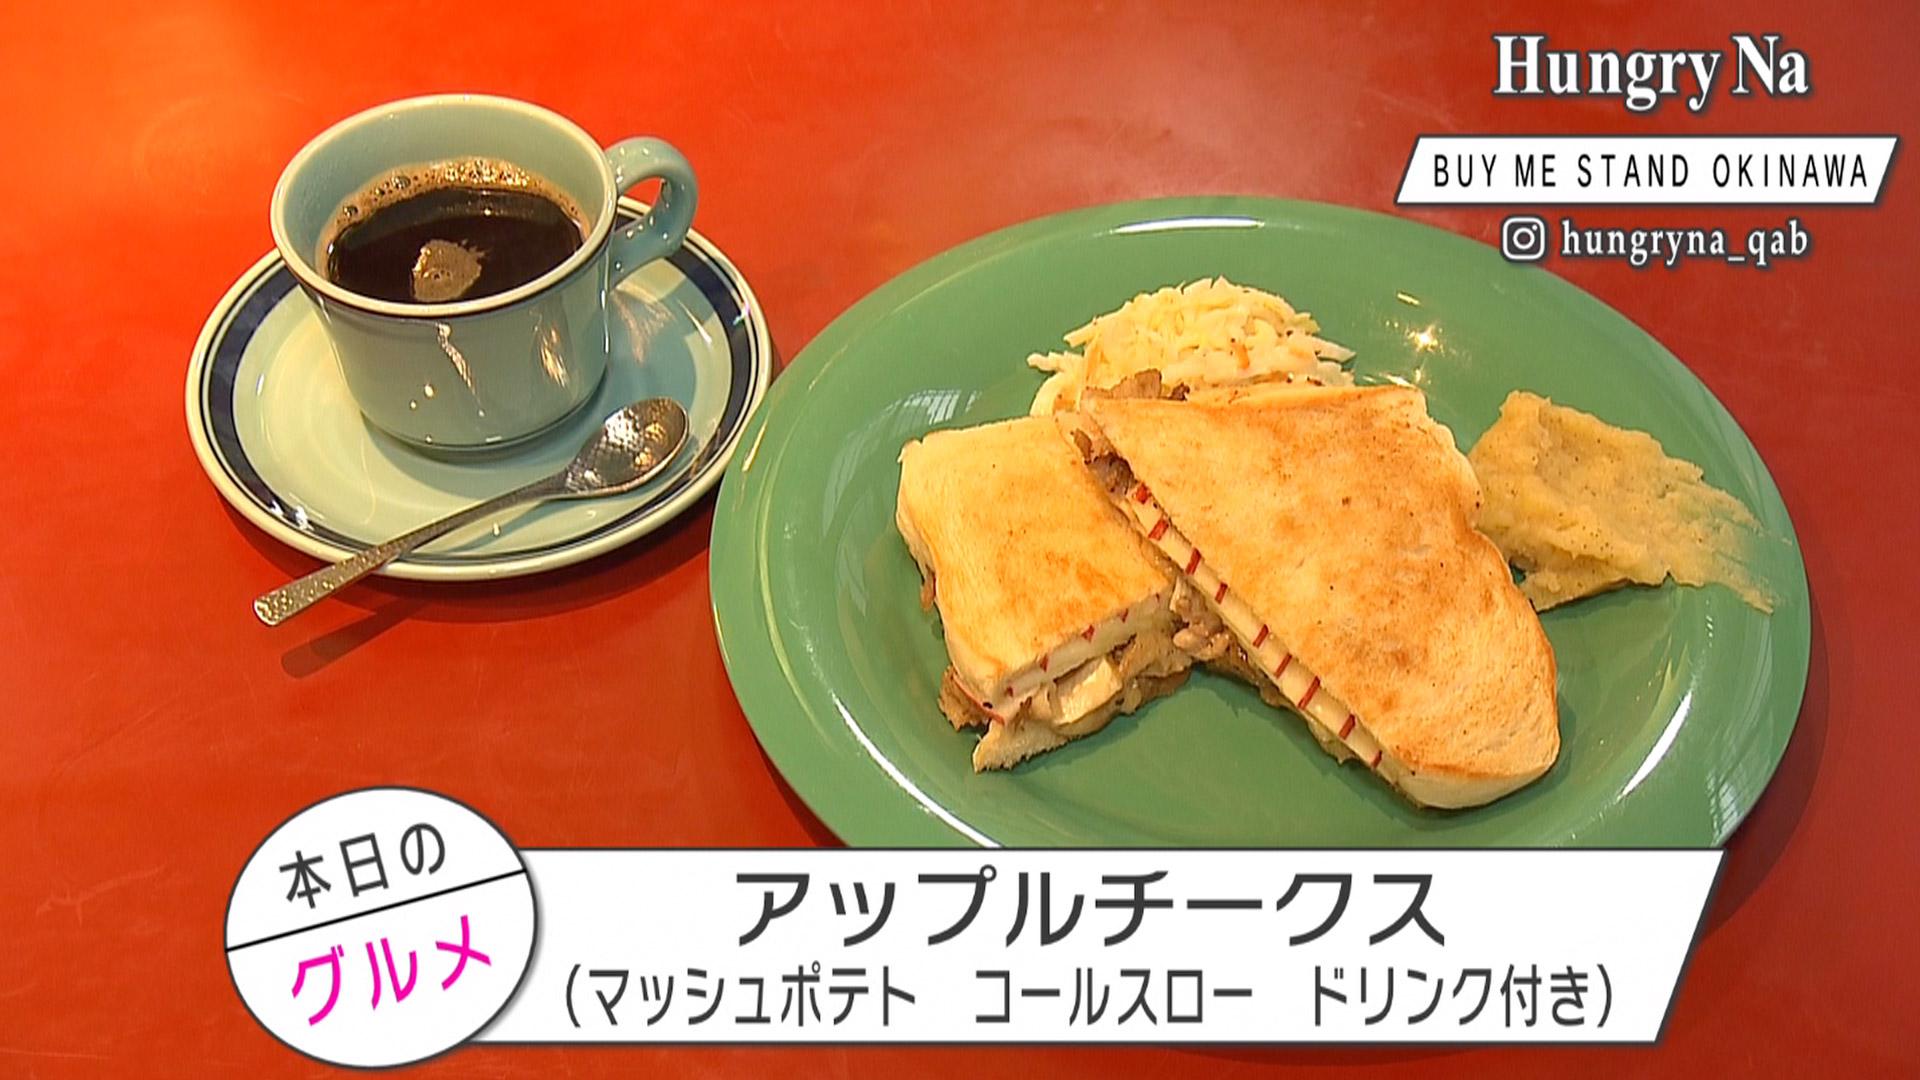 BUY ME STAND OKINAWA × Mizuki